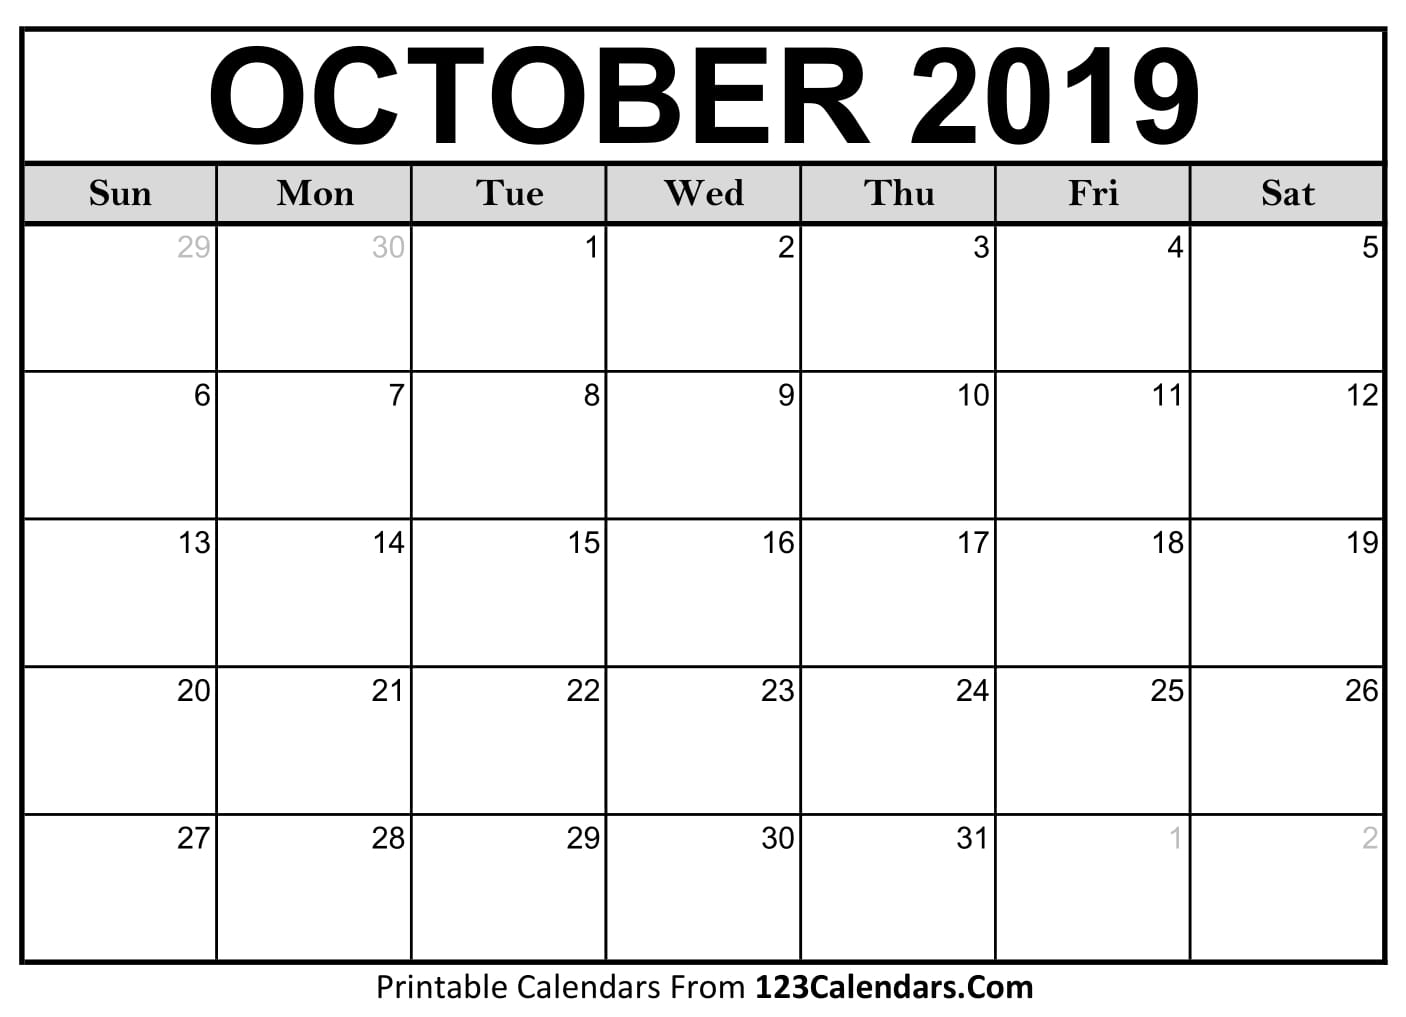 October 2019 Printable Calendar | 123Calendars